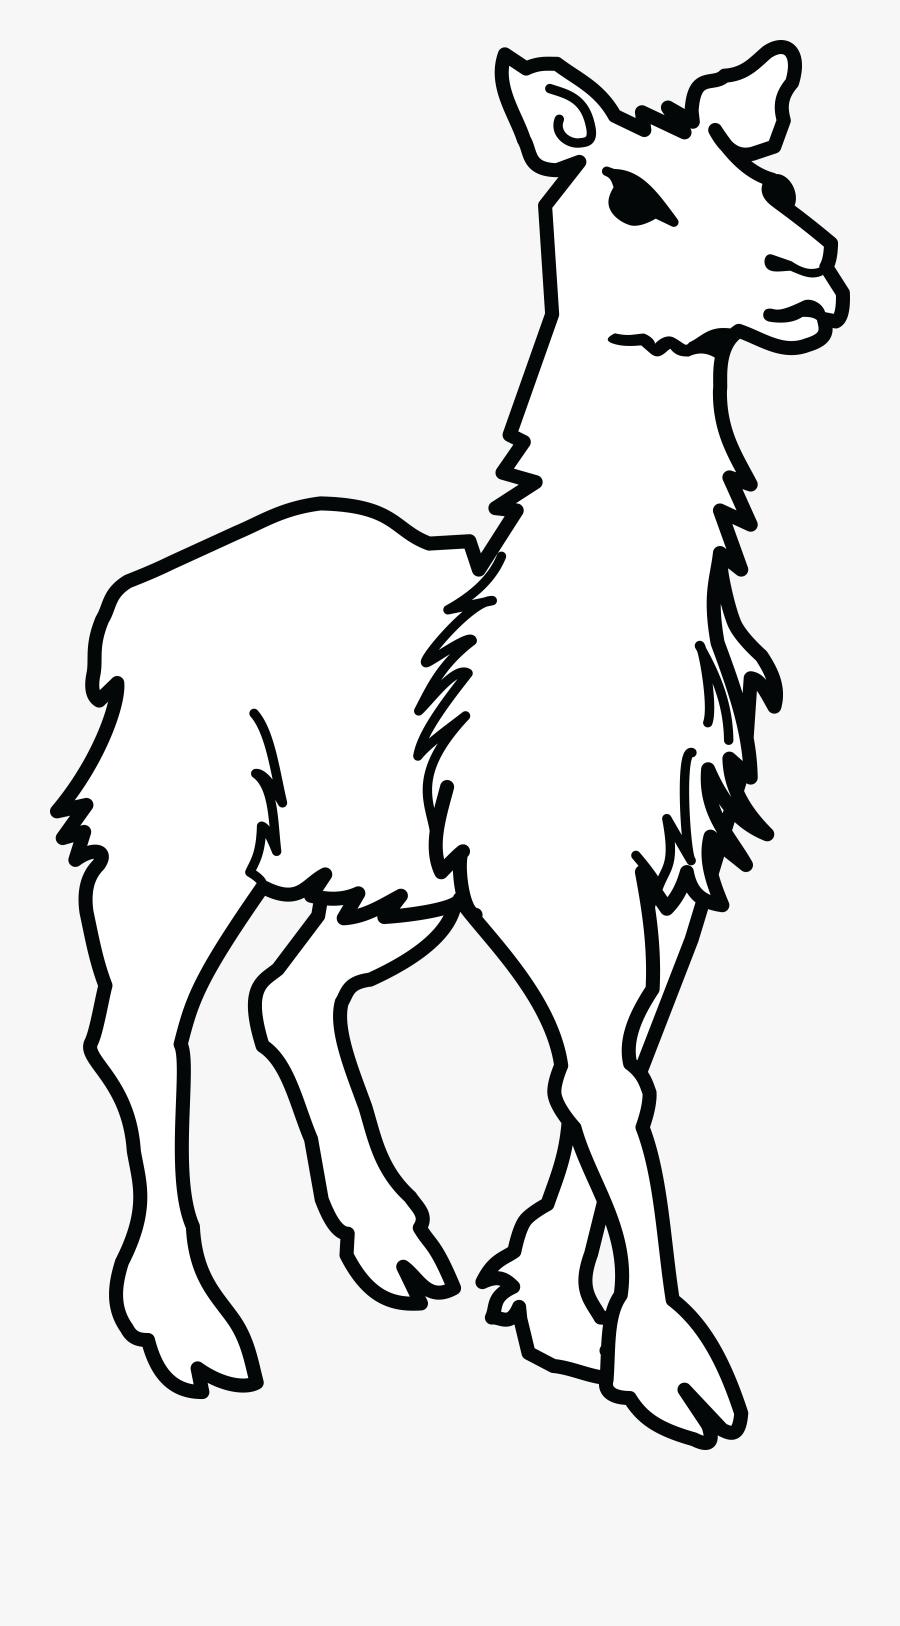 Clipart Llama Lineart - Drawing Of Llamas And Alpacas, Transparent Clipart